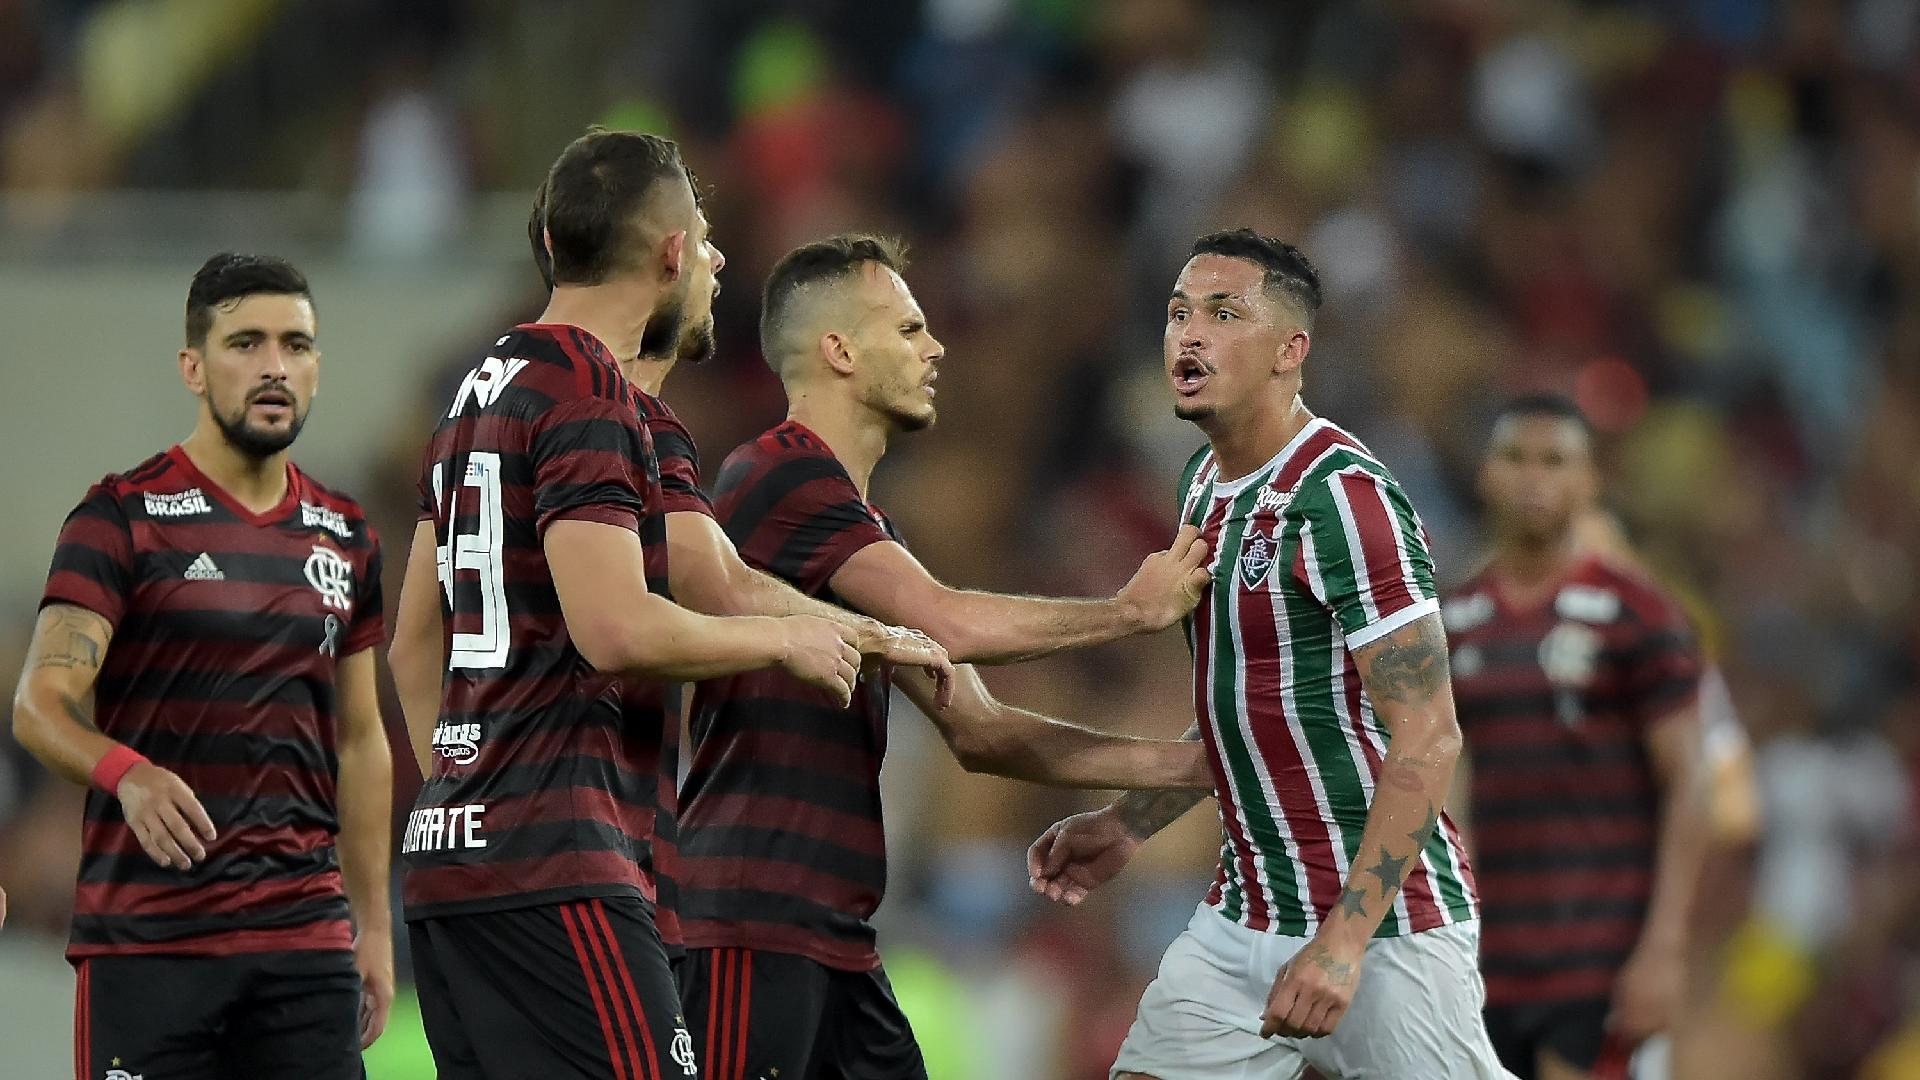 Luciano do Fluminense durante partida contra o Flamengo pelo campeonato Carioca